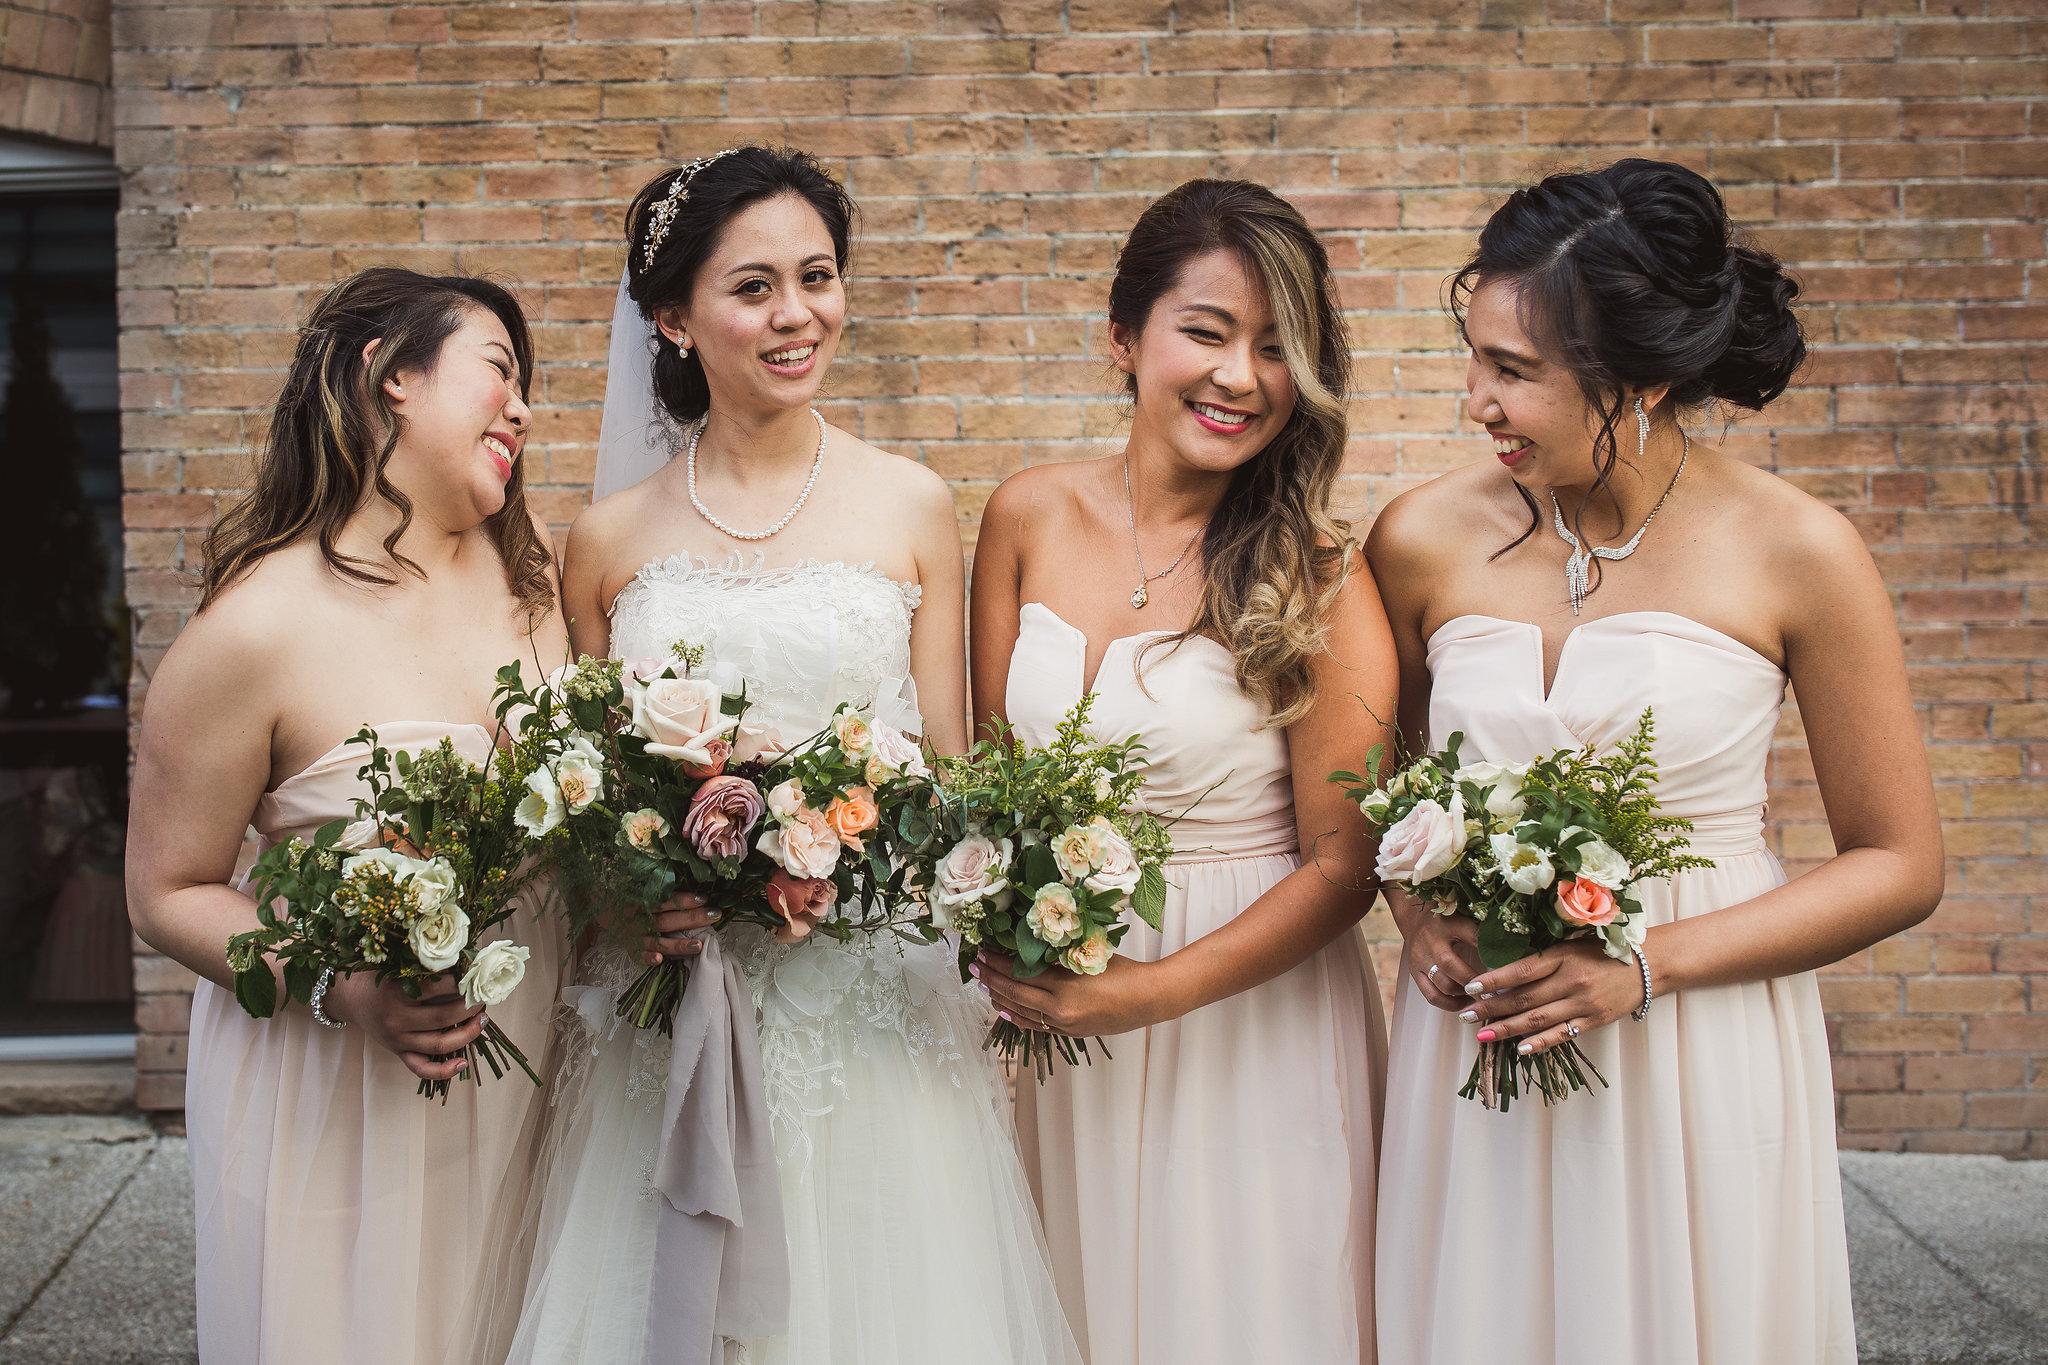 Jessica Jason Hotel Ocho Wedding Photos 530 - Hotel Ocho Wedding